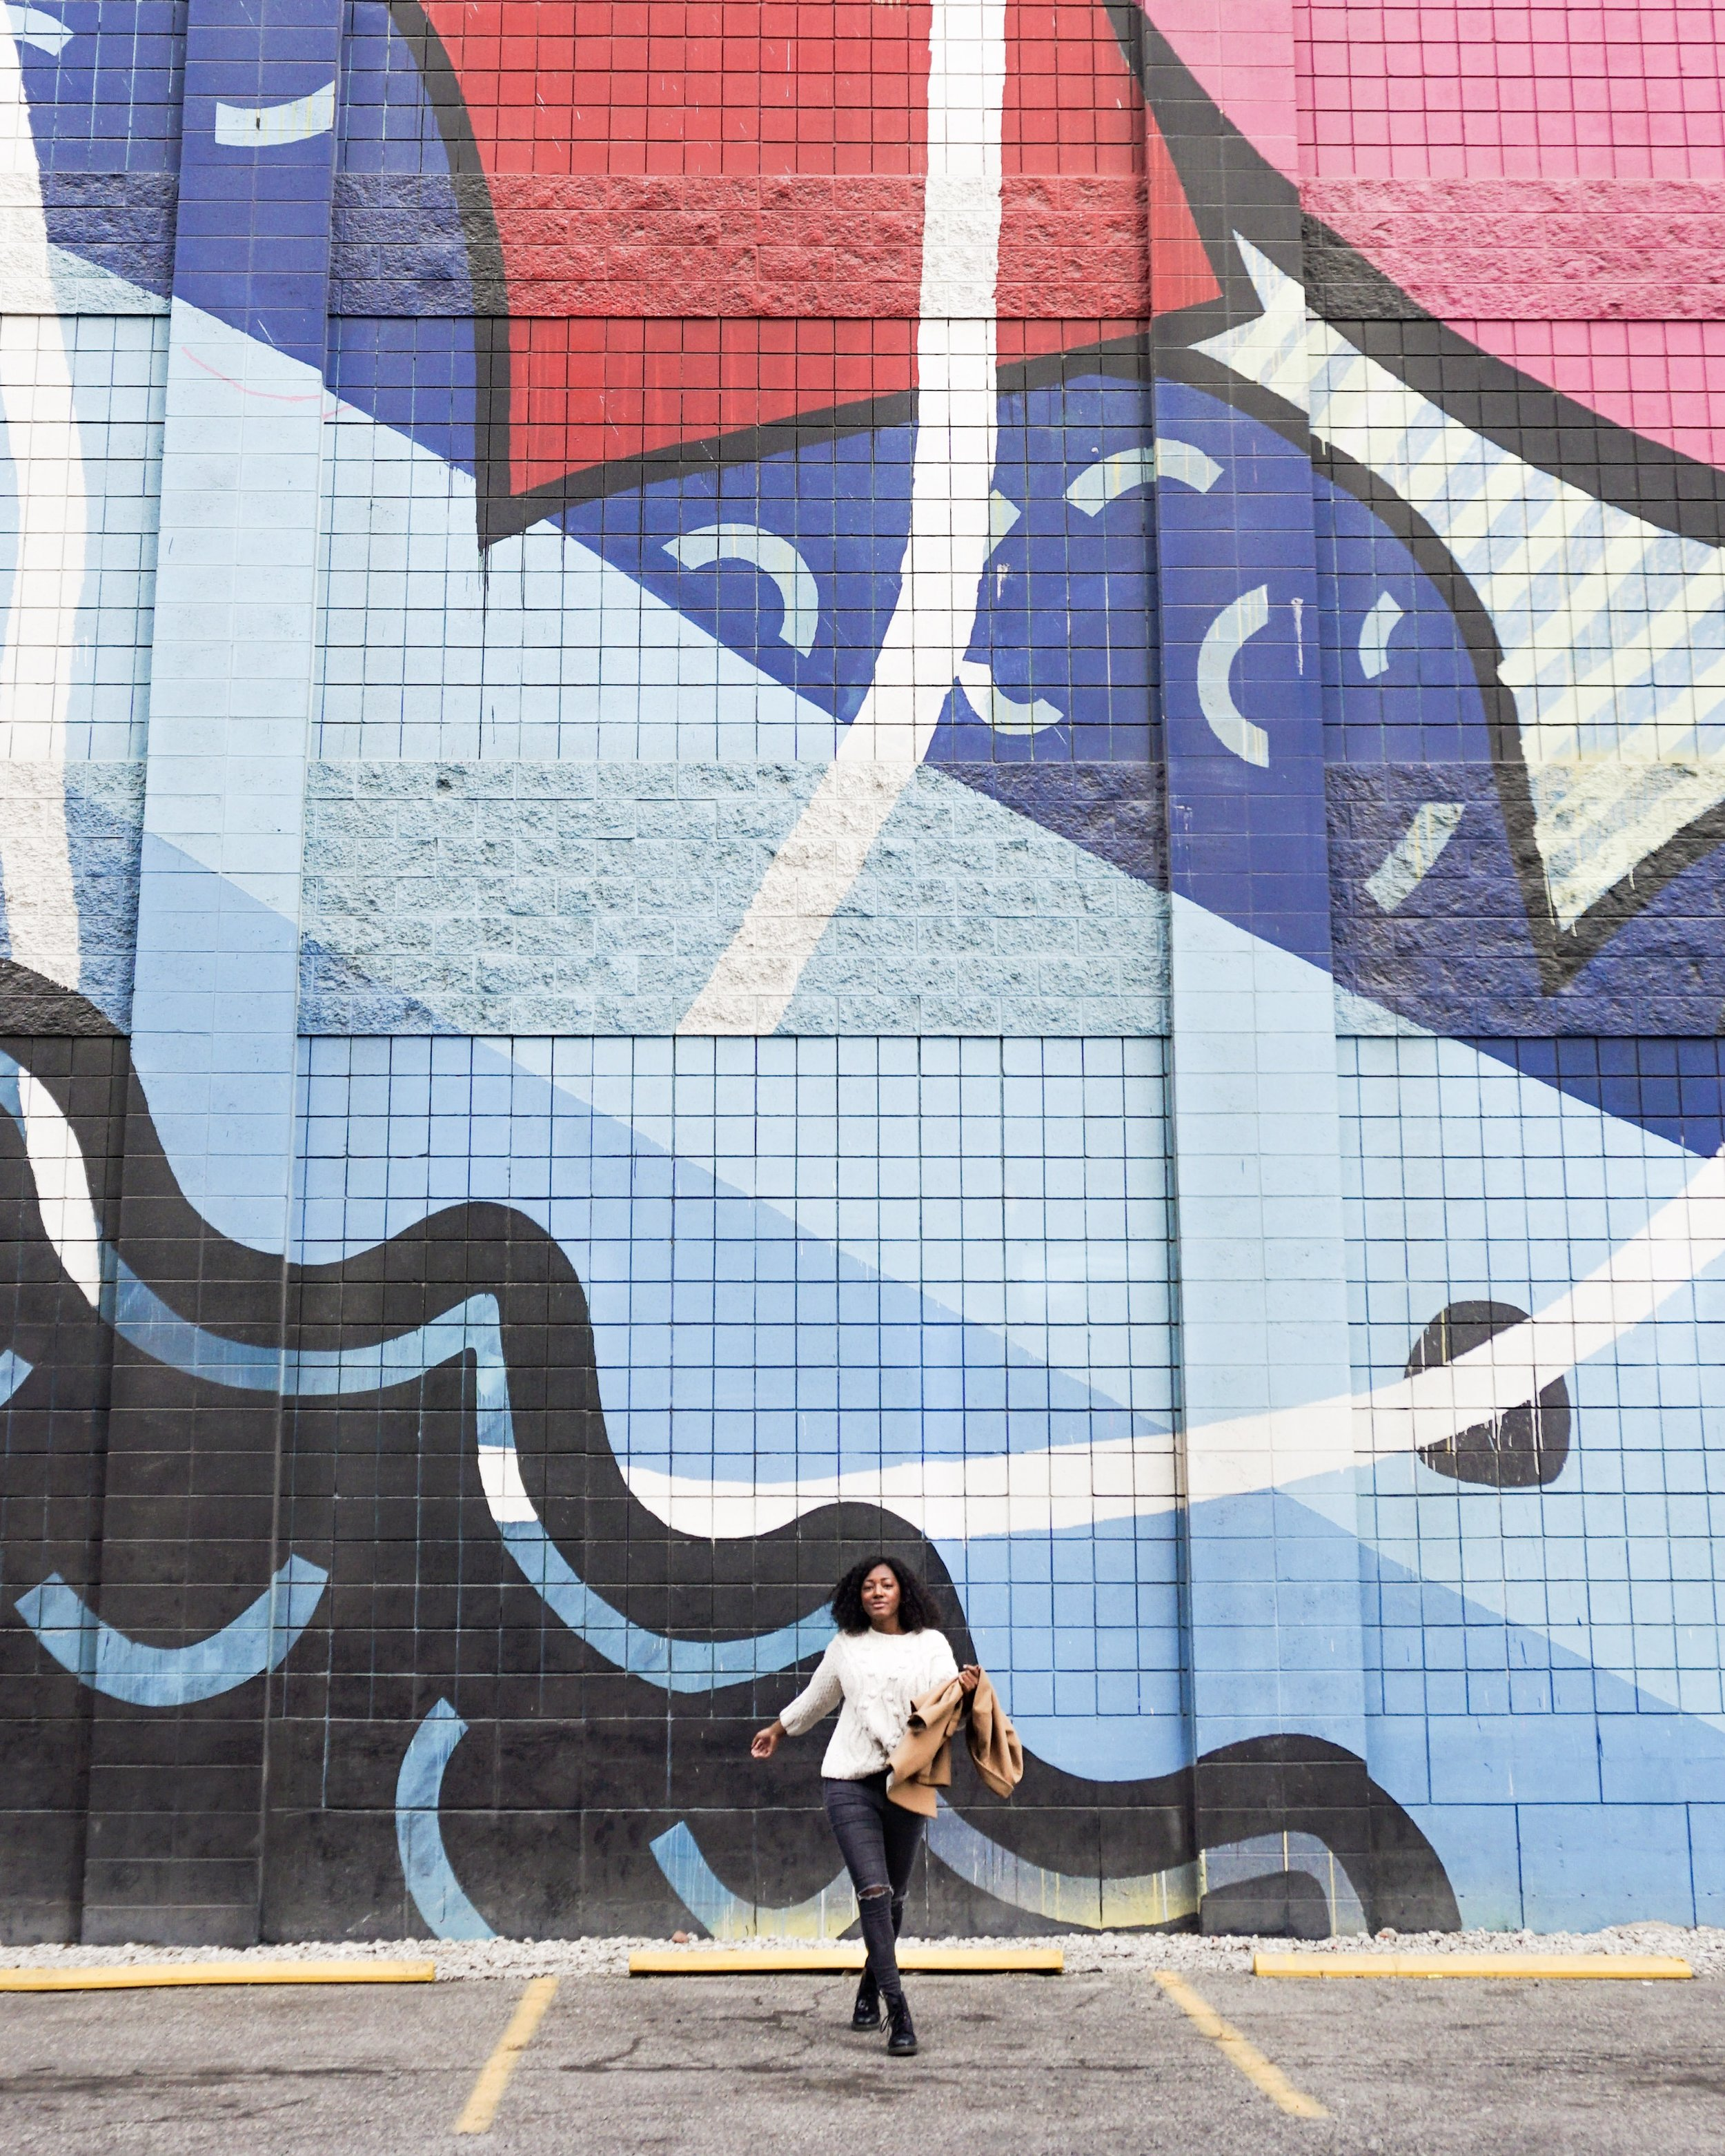 Street art galore in Downtown Detroit